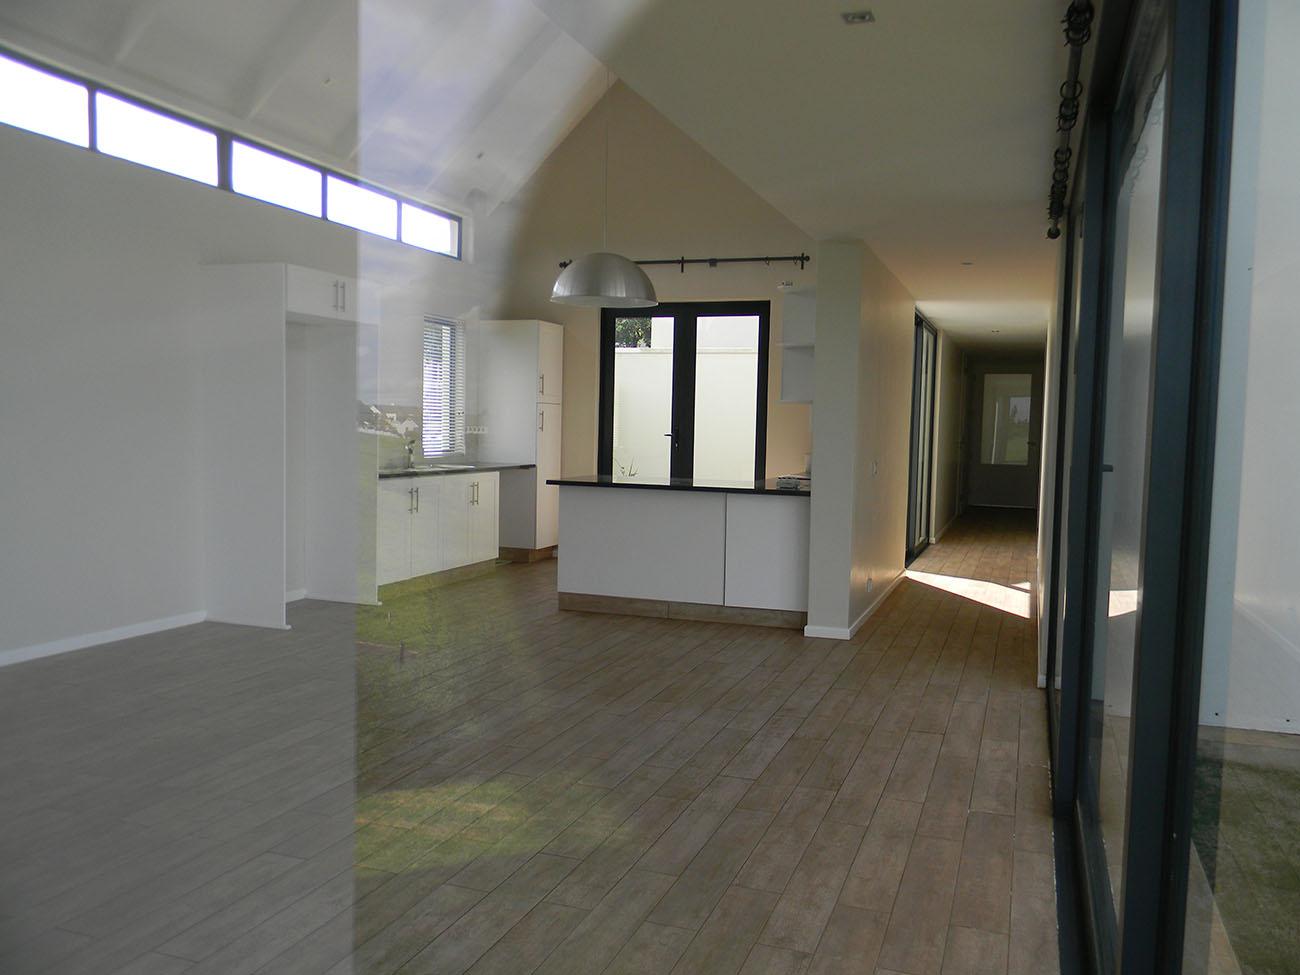 friendly-town-house-for-let-garlington-estate-luxury-country-living-kzn-hilton-farm